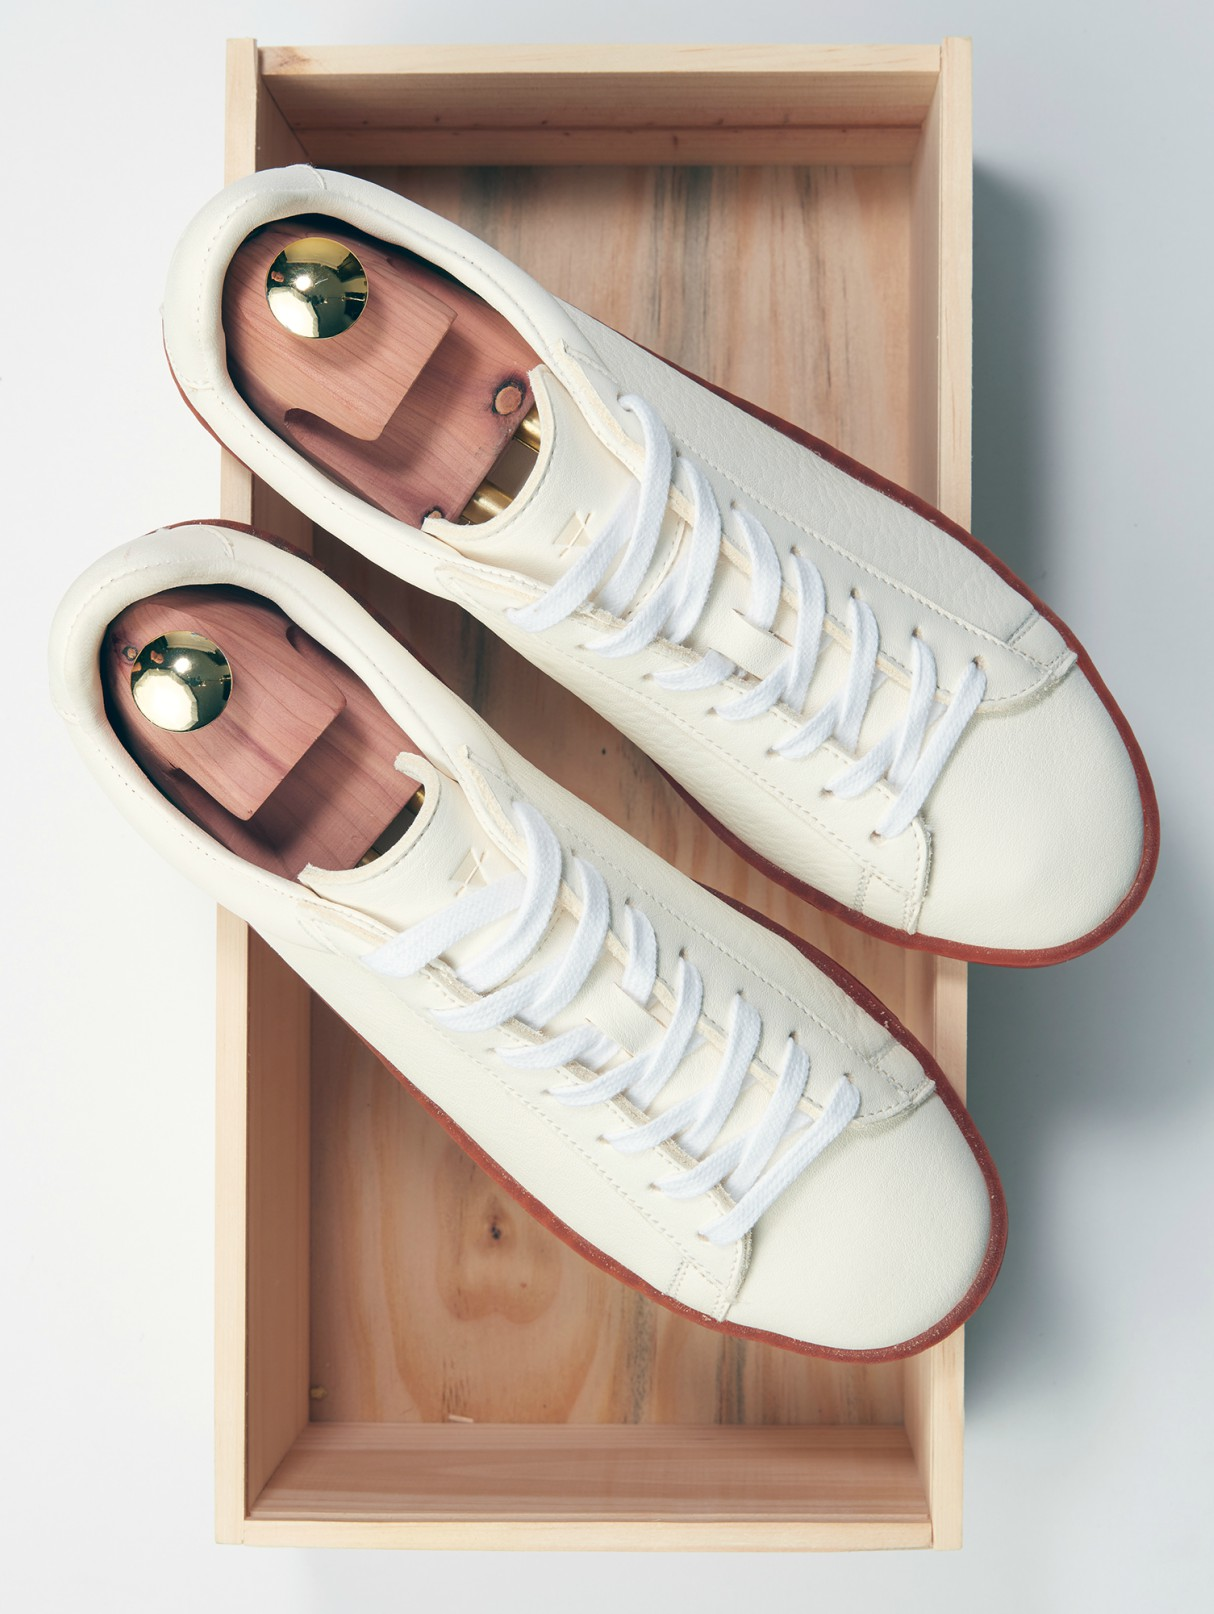 waes-footwear-zero-waste-plastic-free-shoe-collection-2019-2